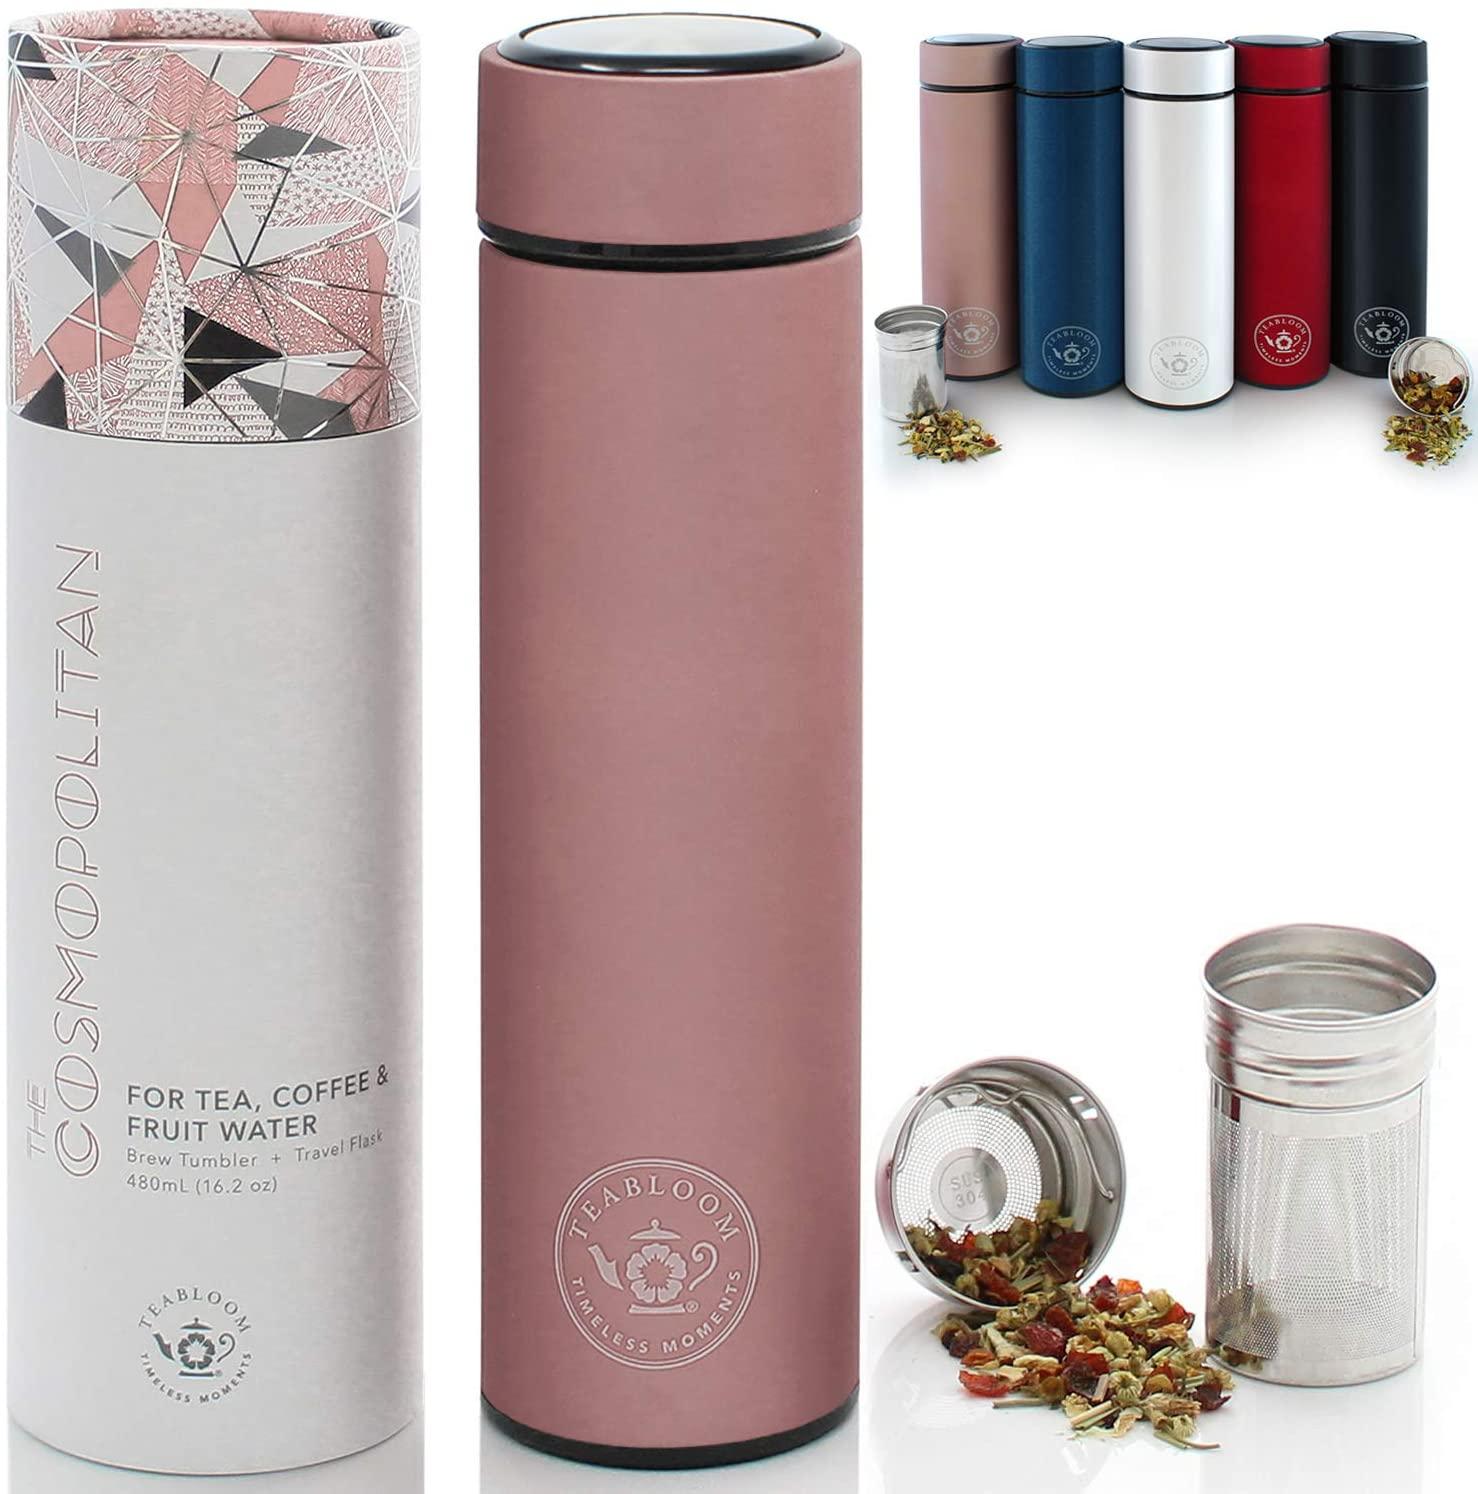 Teabloom All Beverage Tumbler - WorkwearToronto.com - Best Christmas ideas for 2020 - Amazon